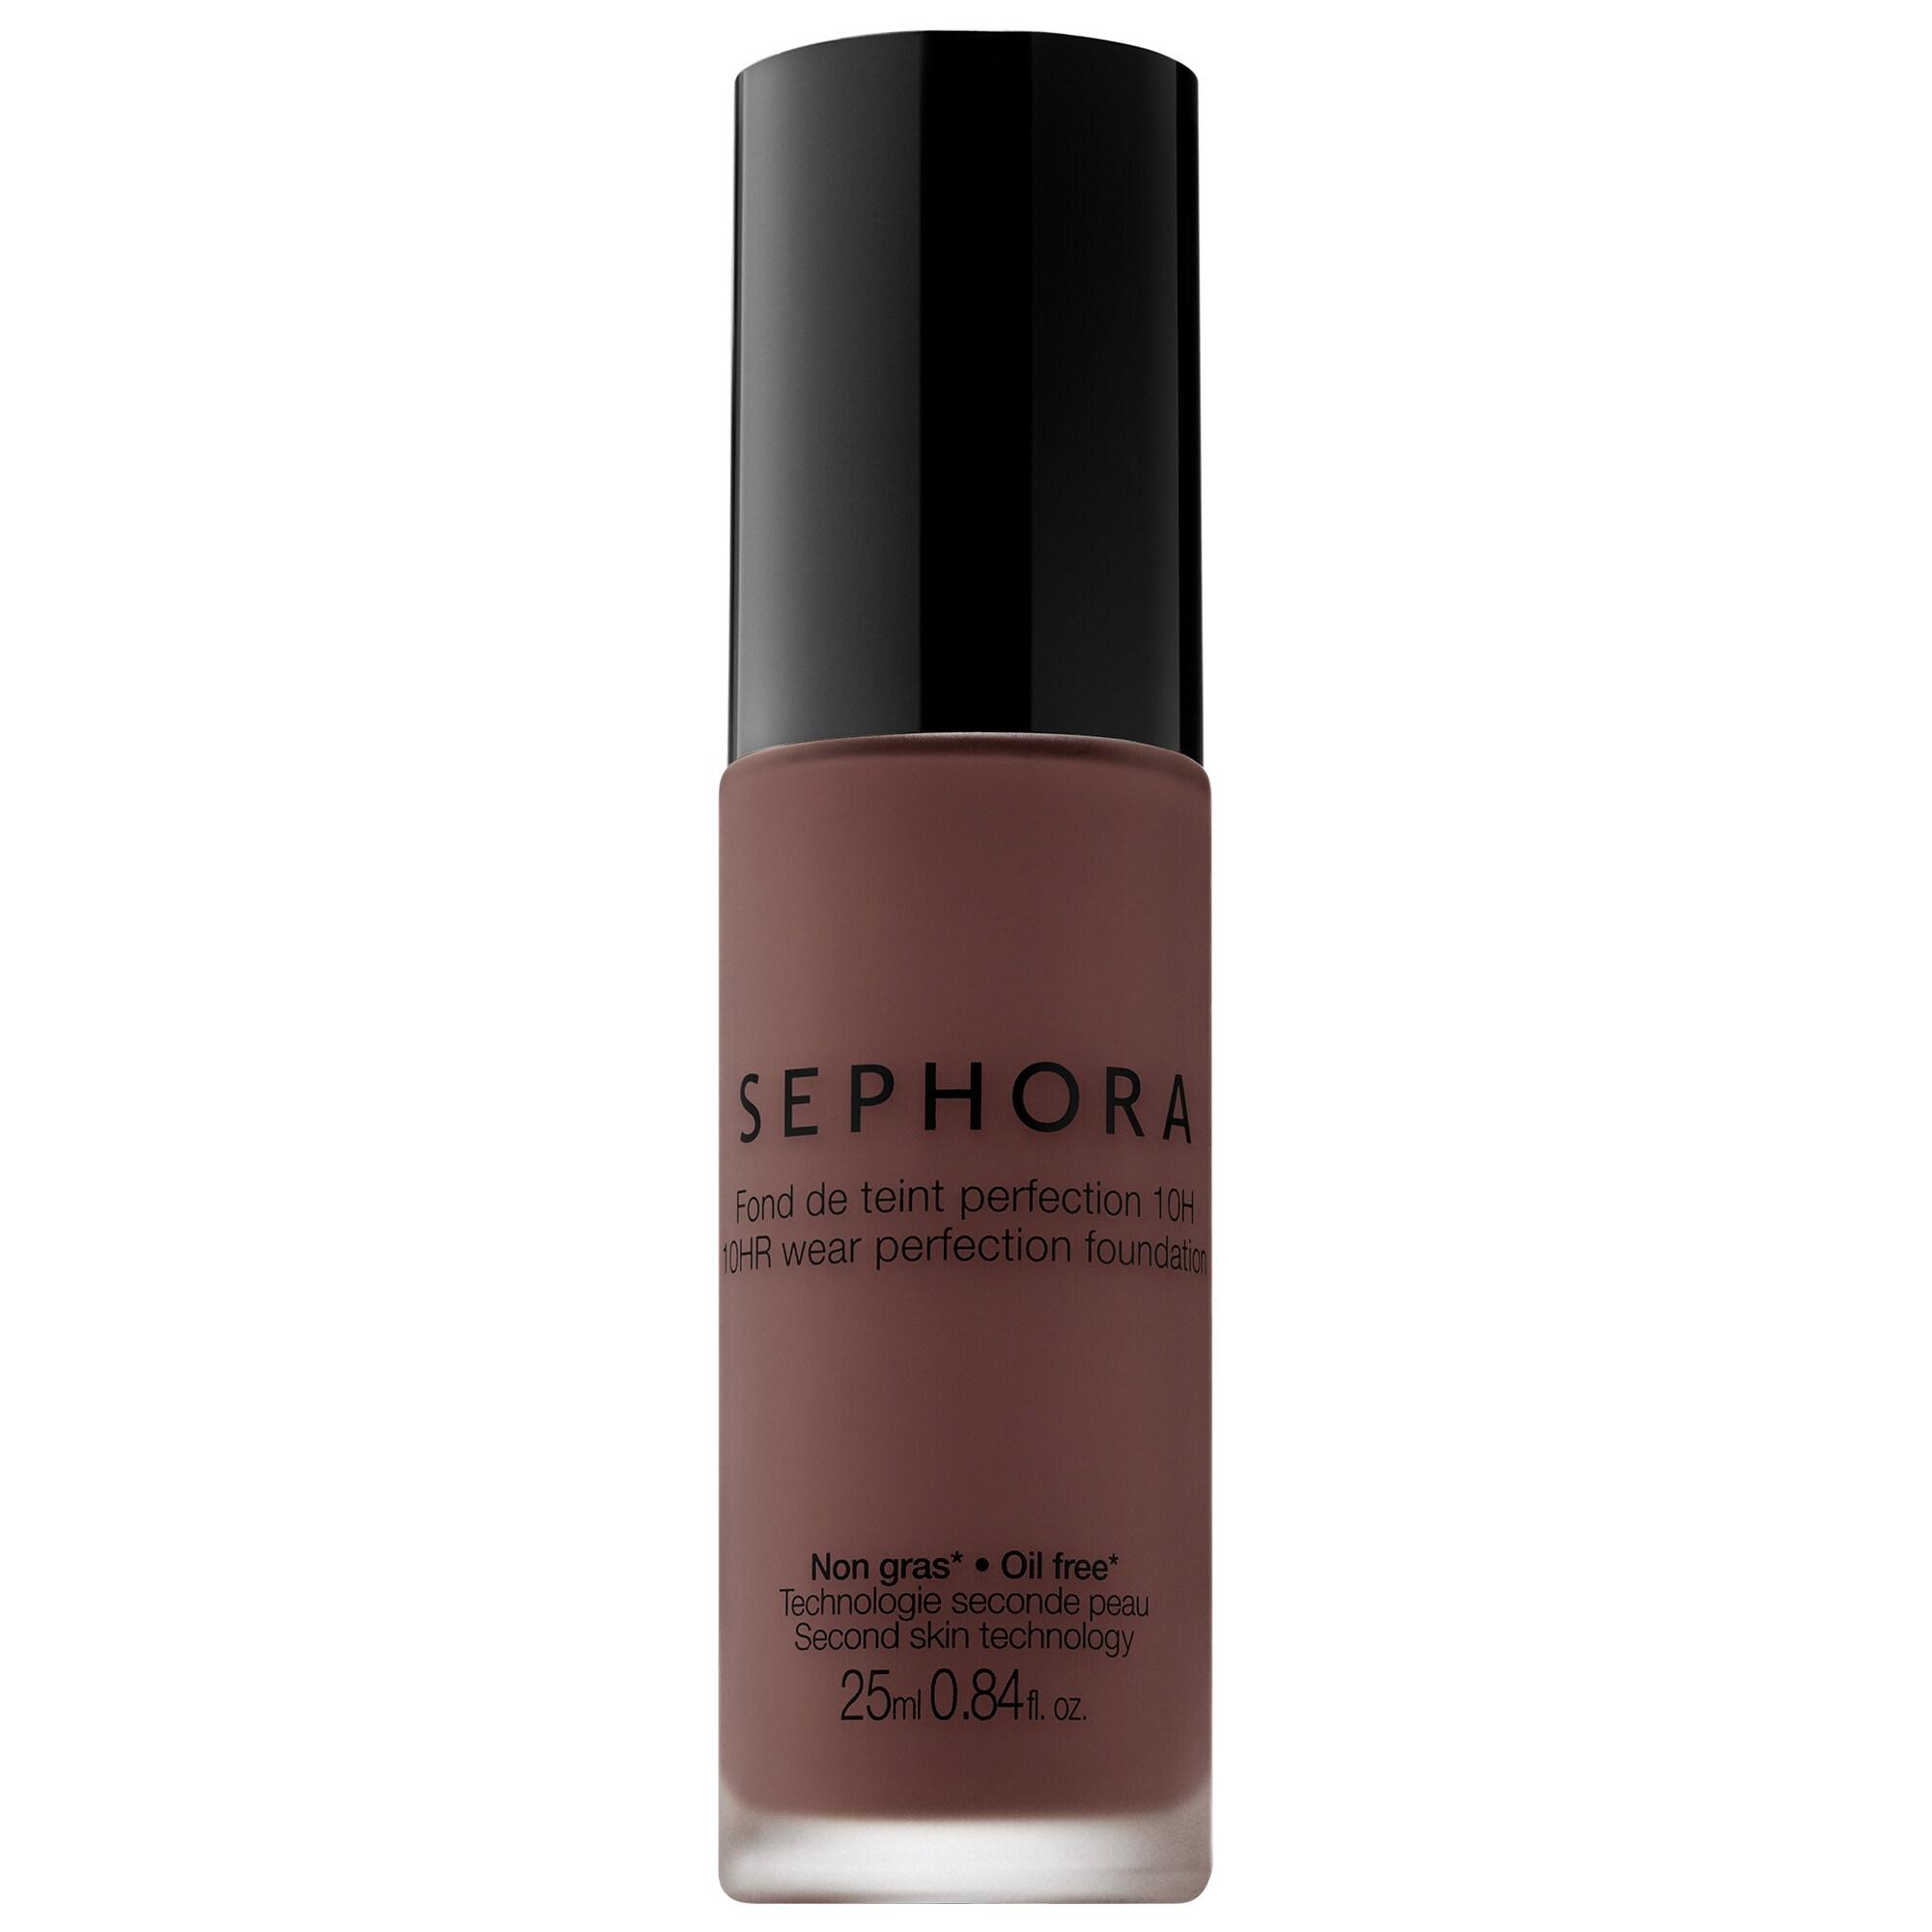 Sephora - 10 HR Wear Perfection Foundation